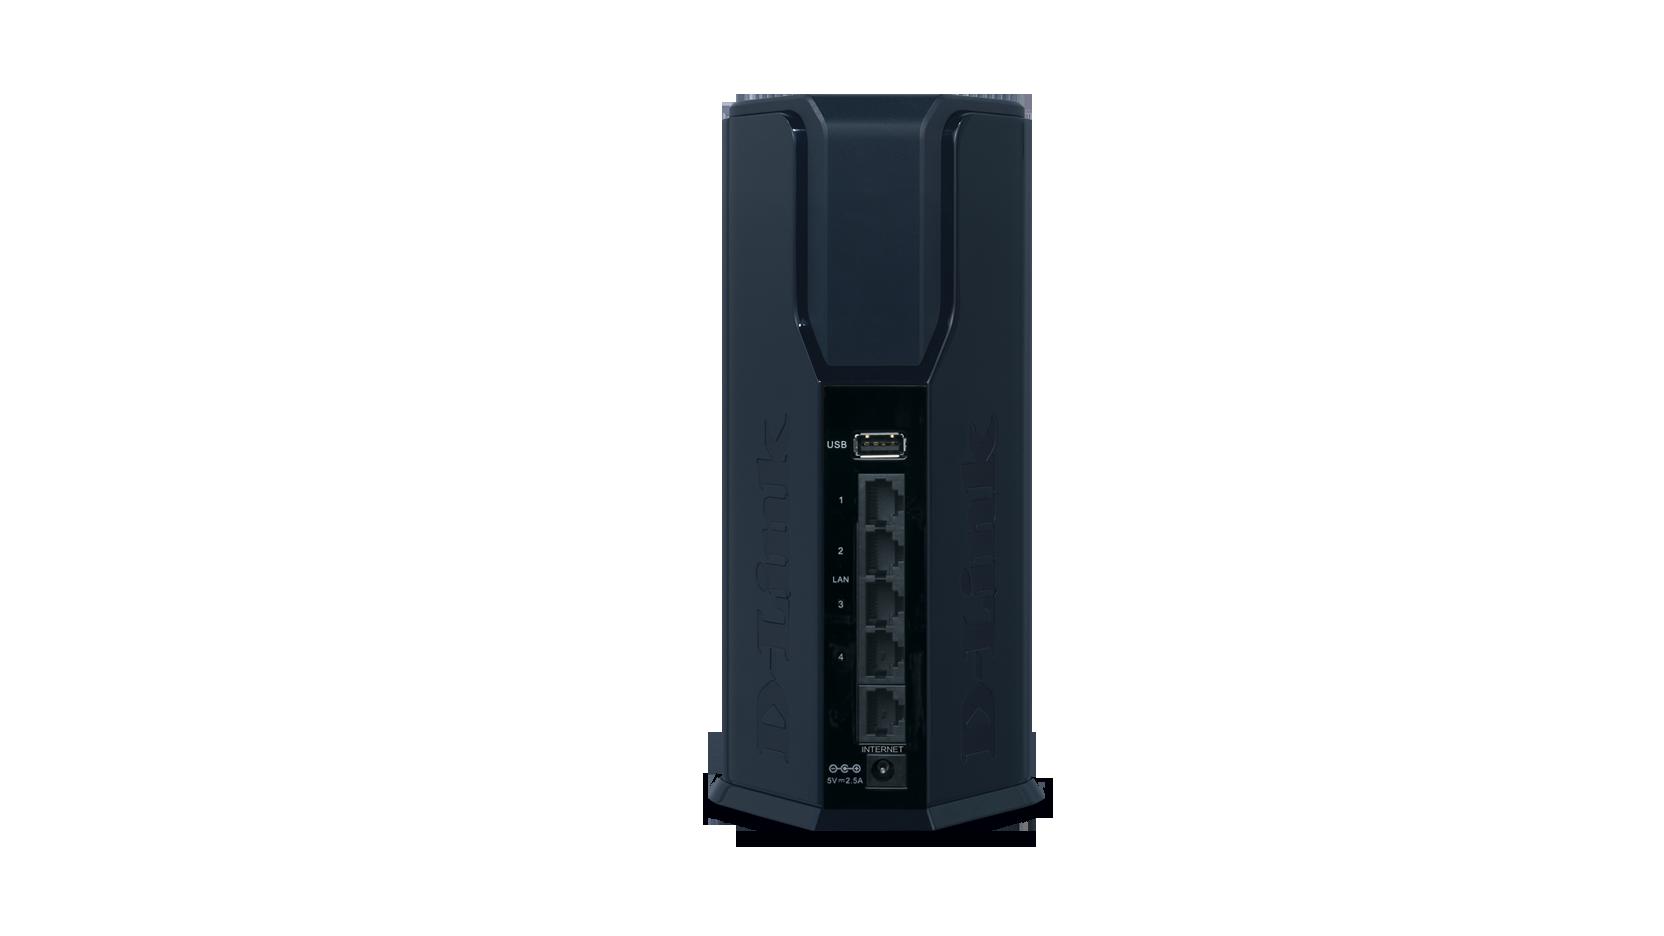 D-Link DIR-645 revA1 Router Drivers Download